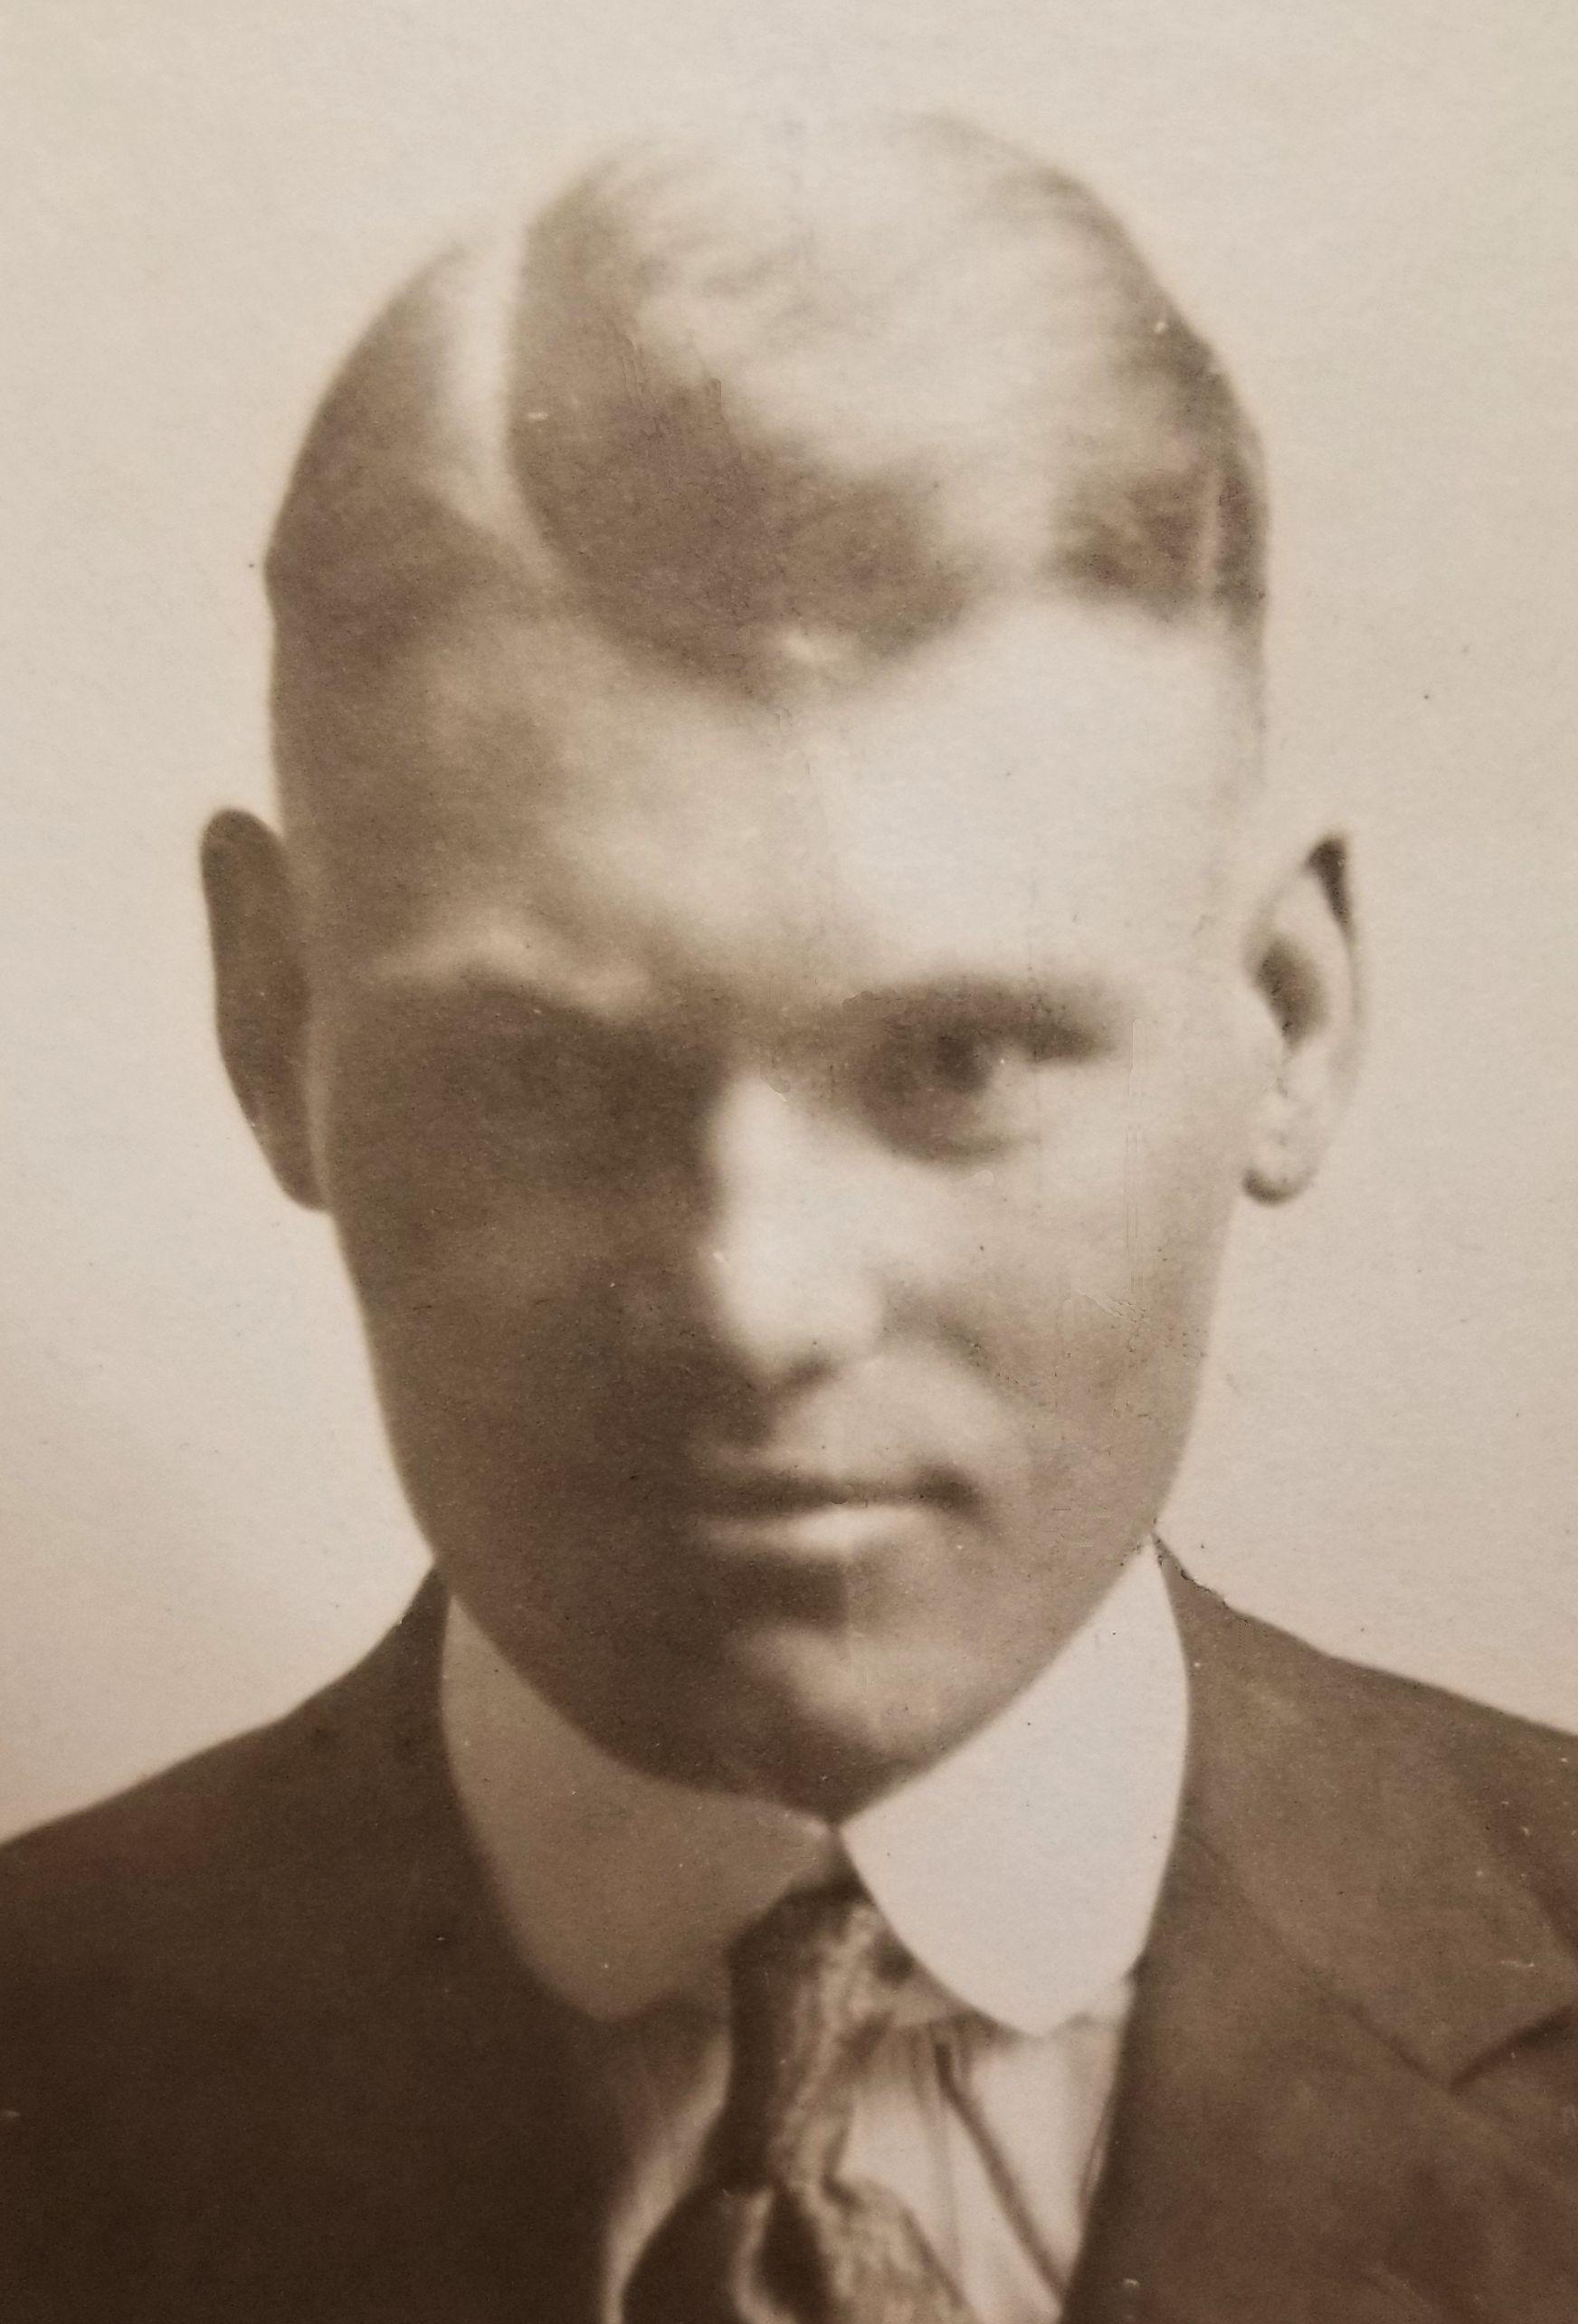 Wiberg, Reuben Magnus